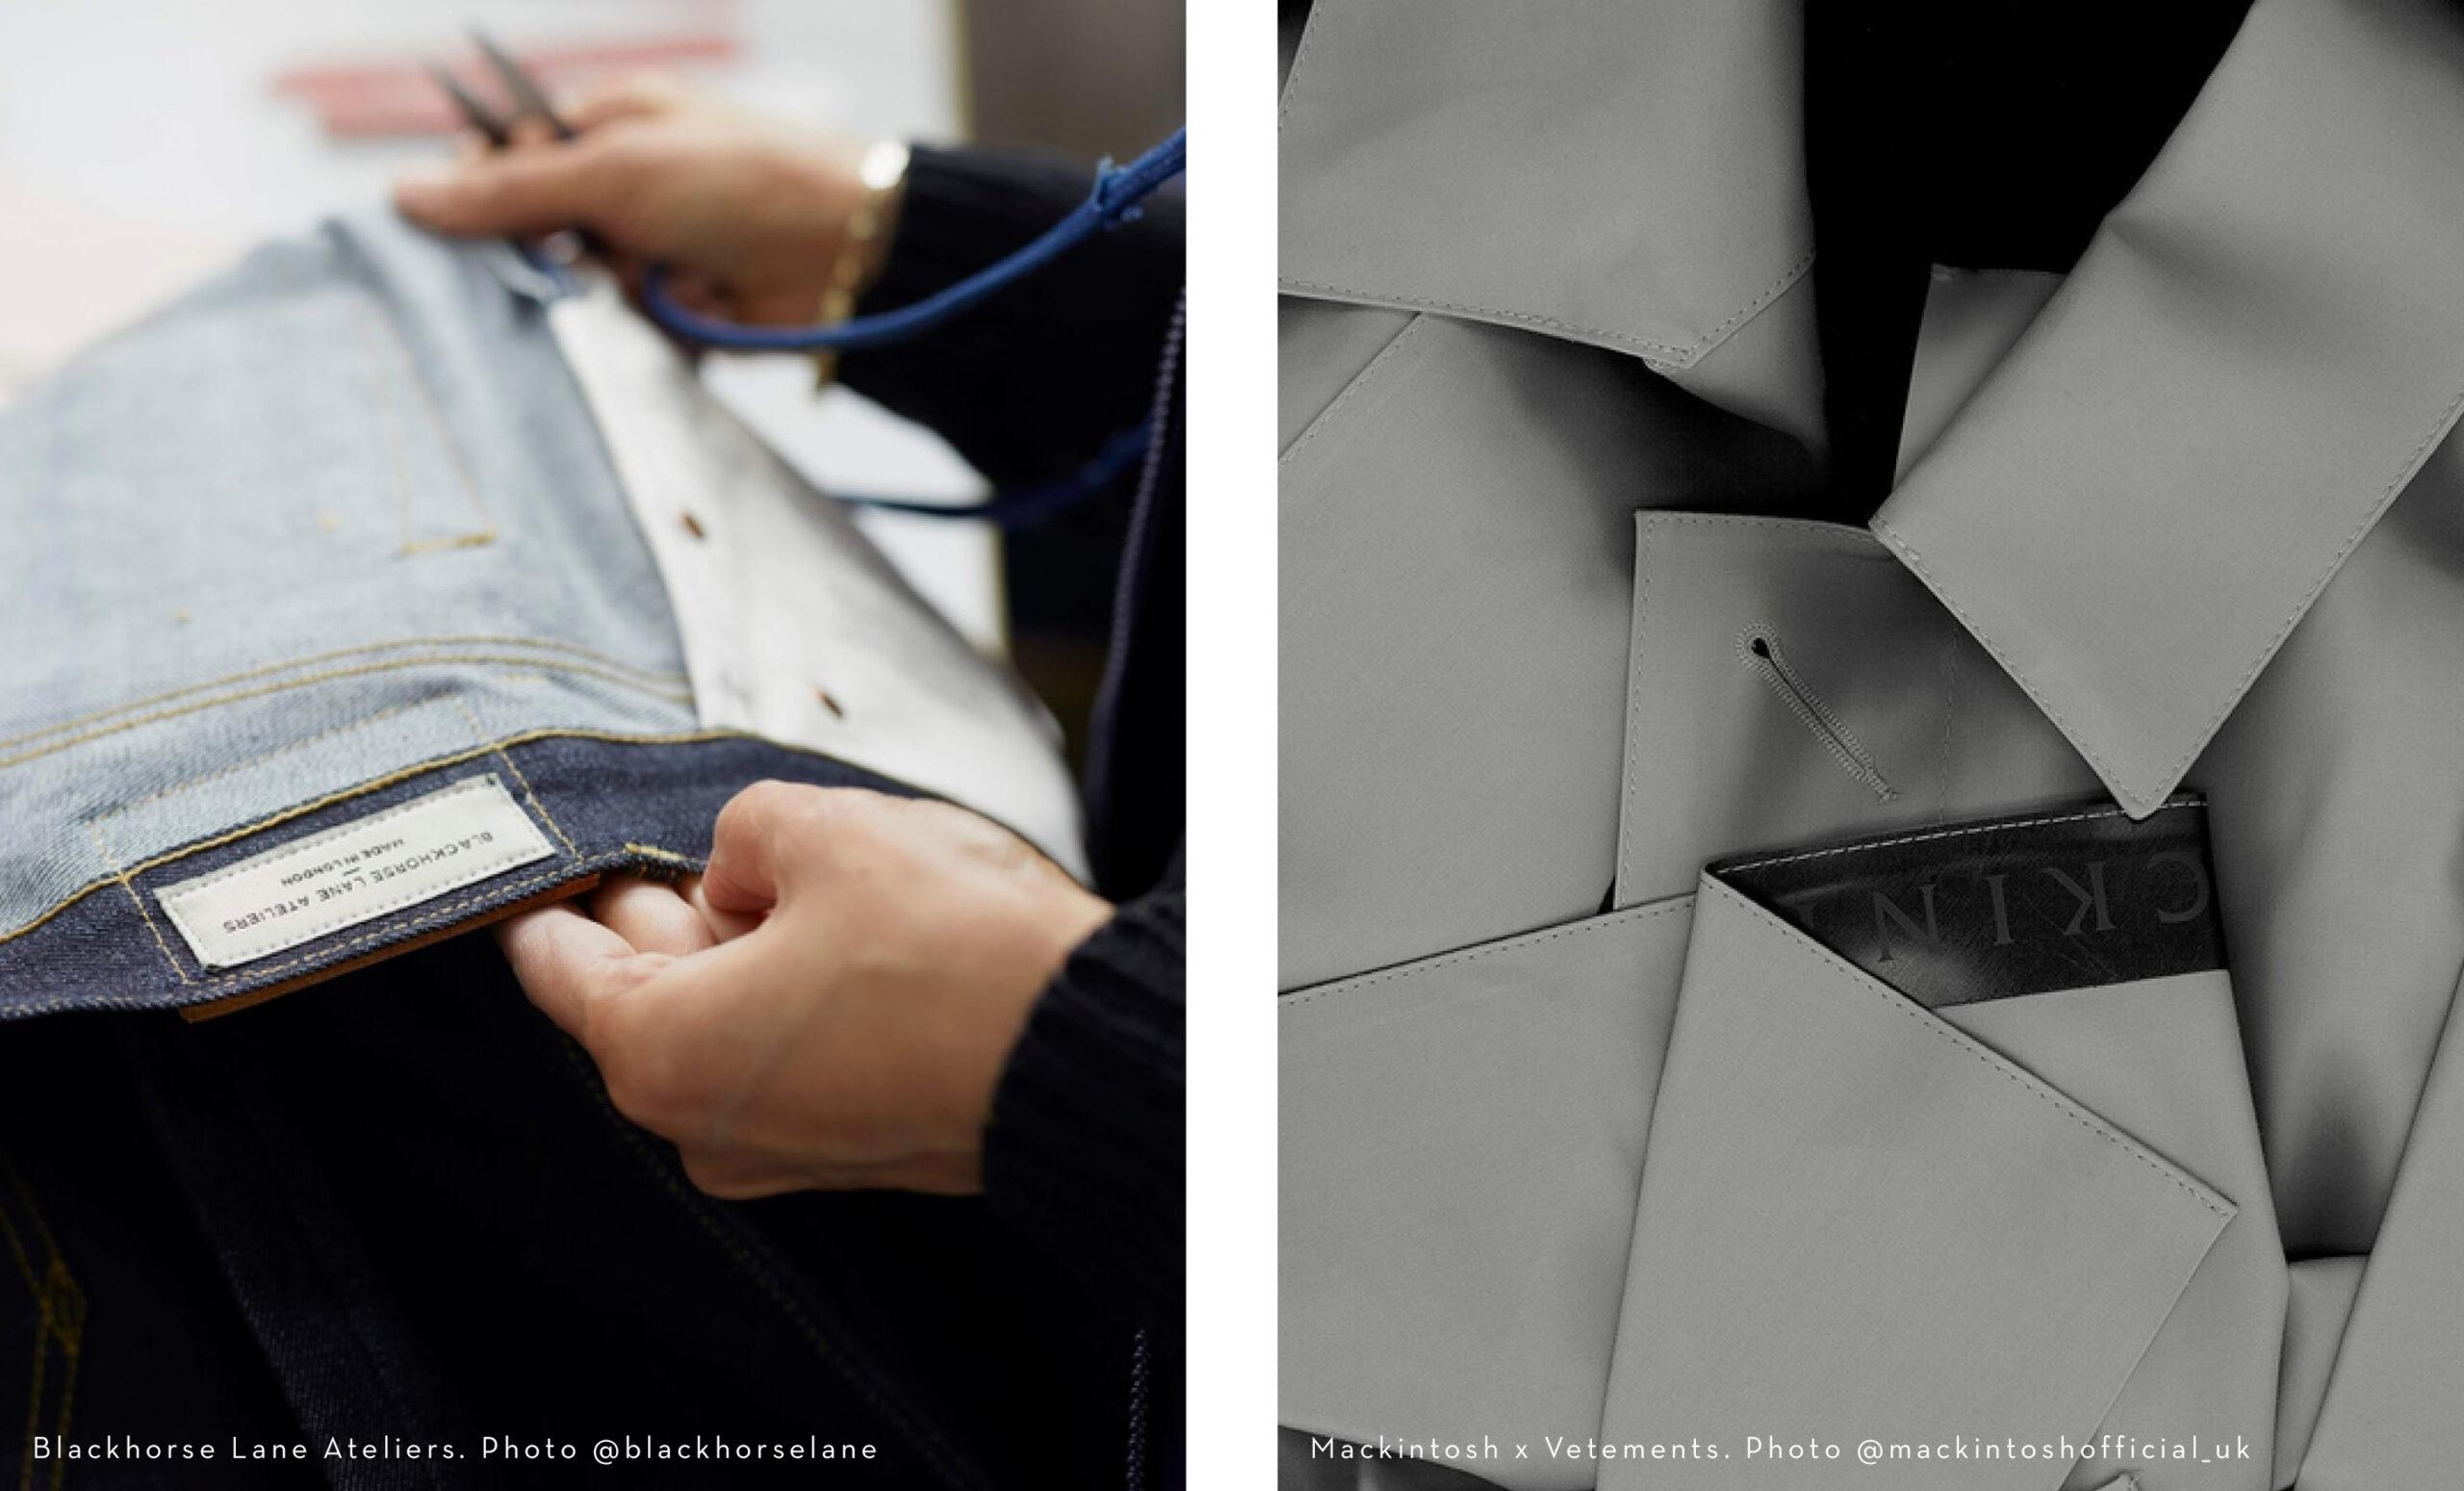 Precision Design - Blackhorse Lane Ateliers - Mackintosh x Vetements